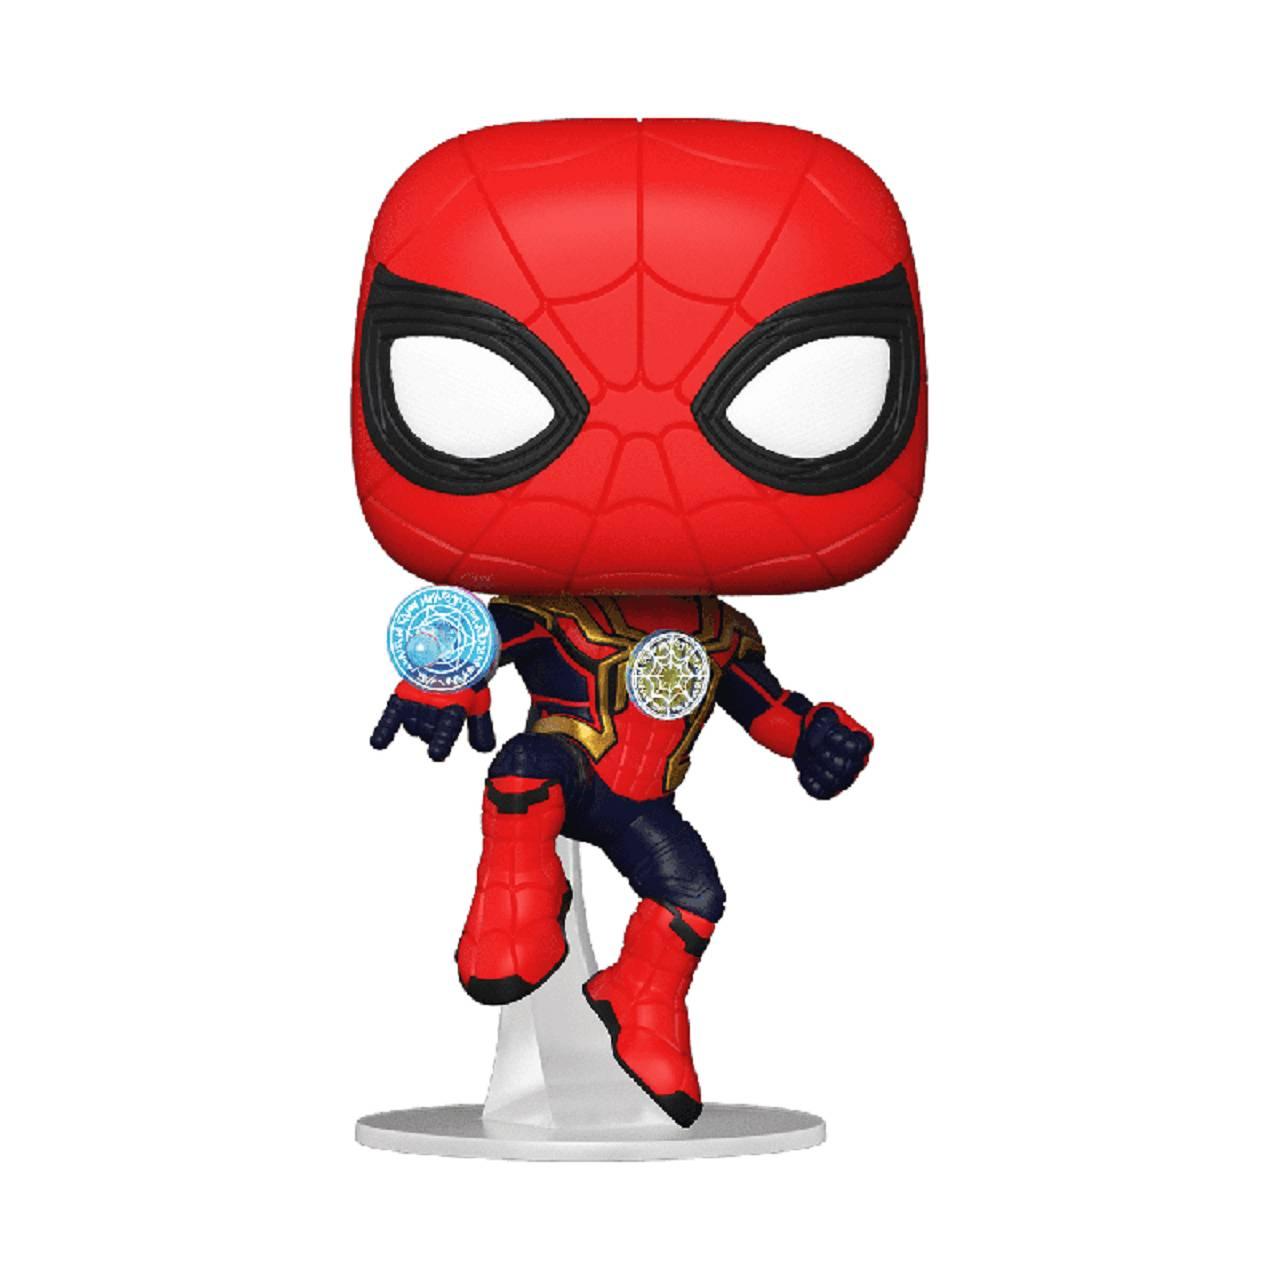 Spiderman Traje No Way Home Magia Doctor Strange Funko